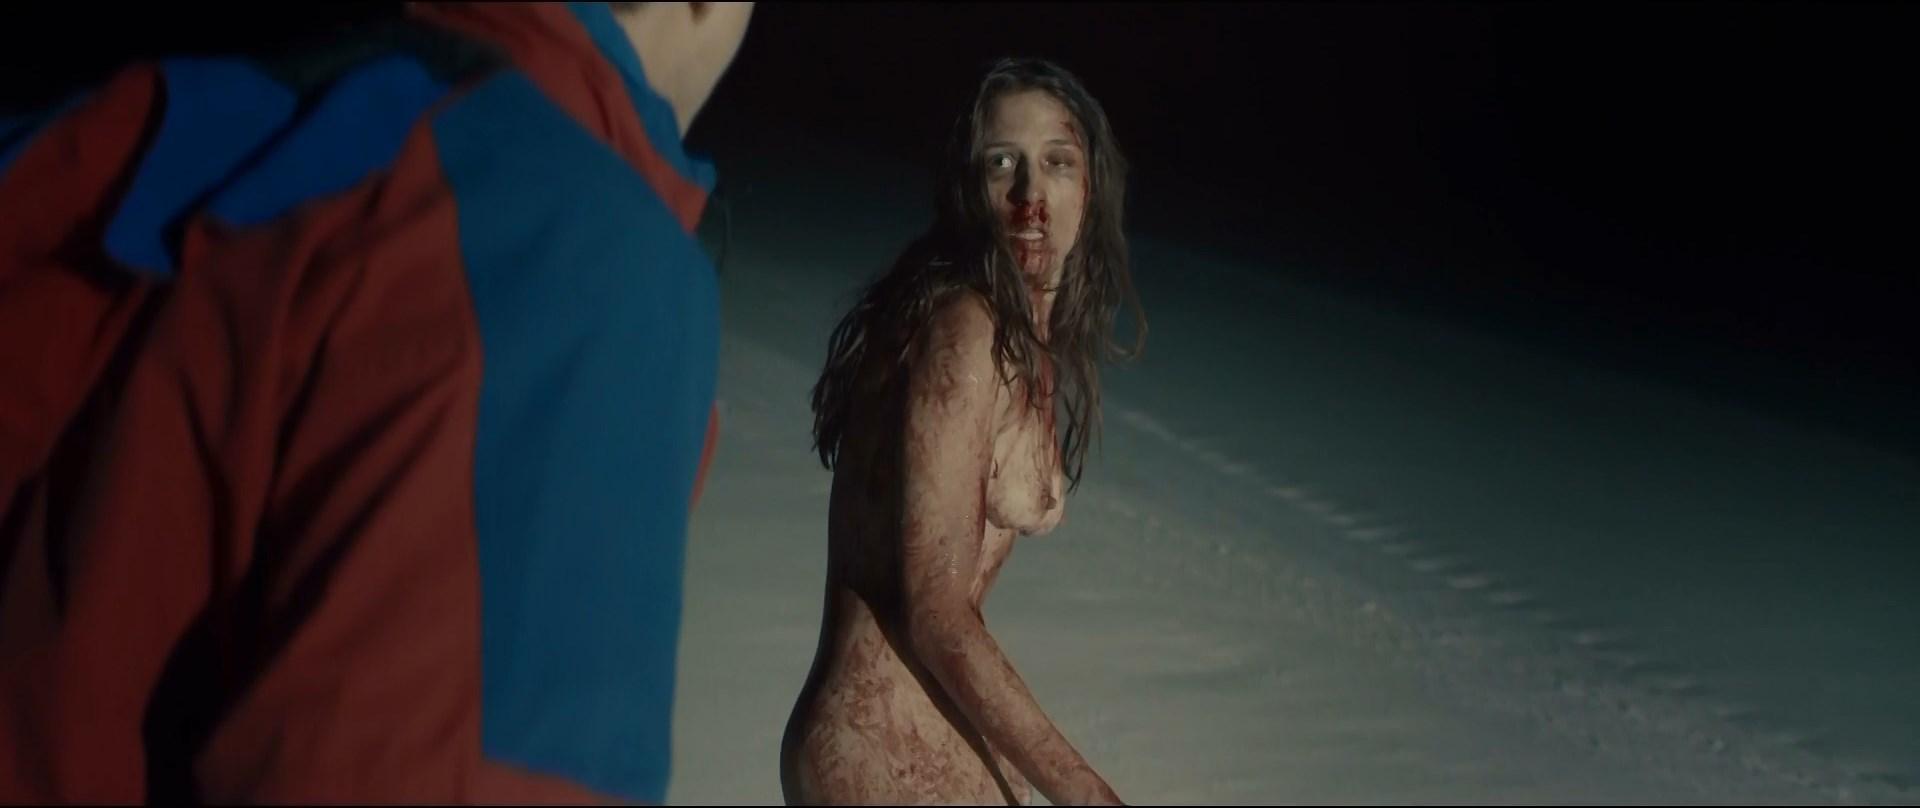 Anna Sophie Krenn nude - Der Pass s01e01: Finsternis (2019)